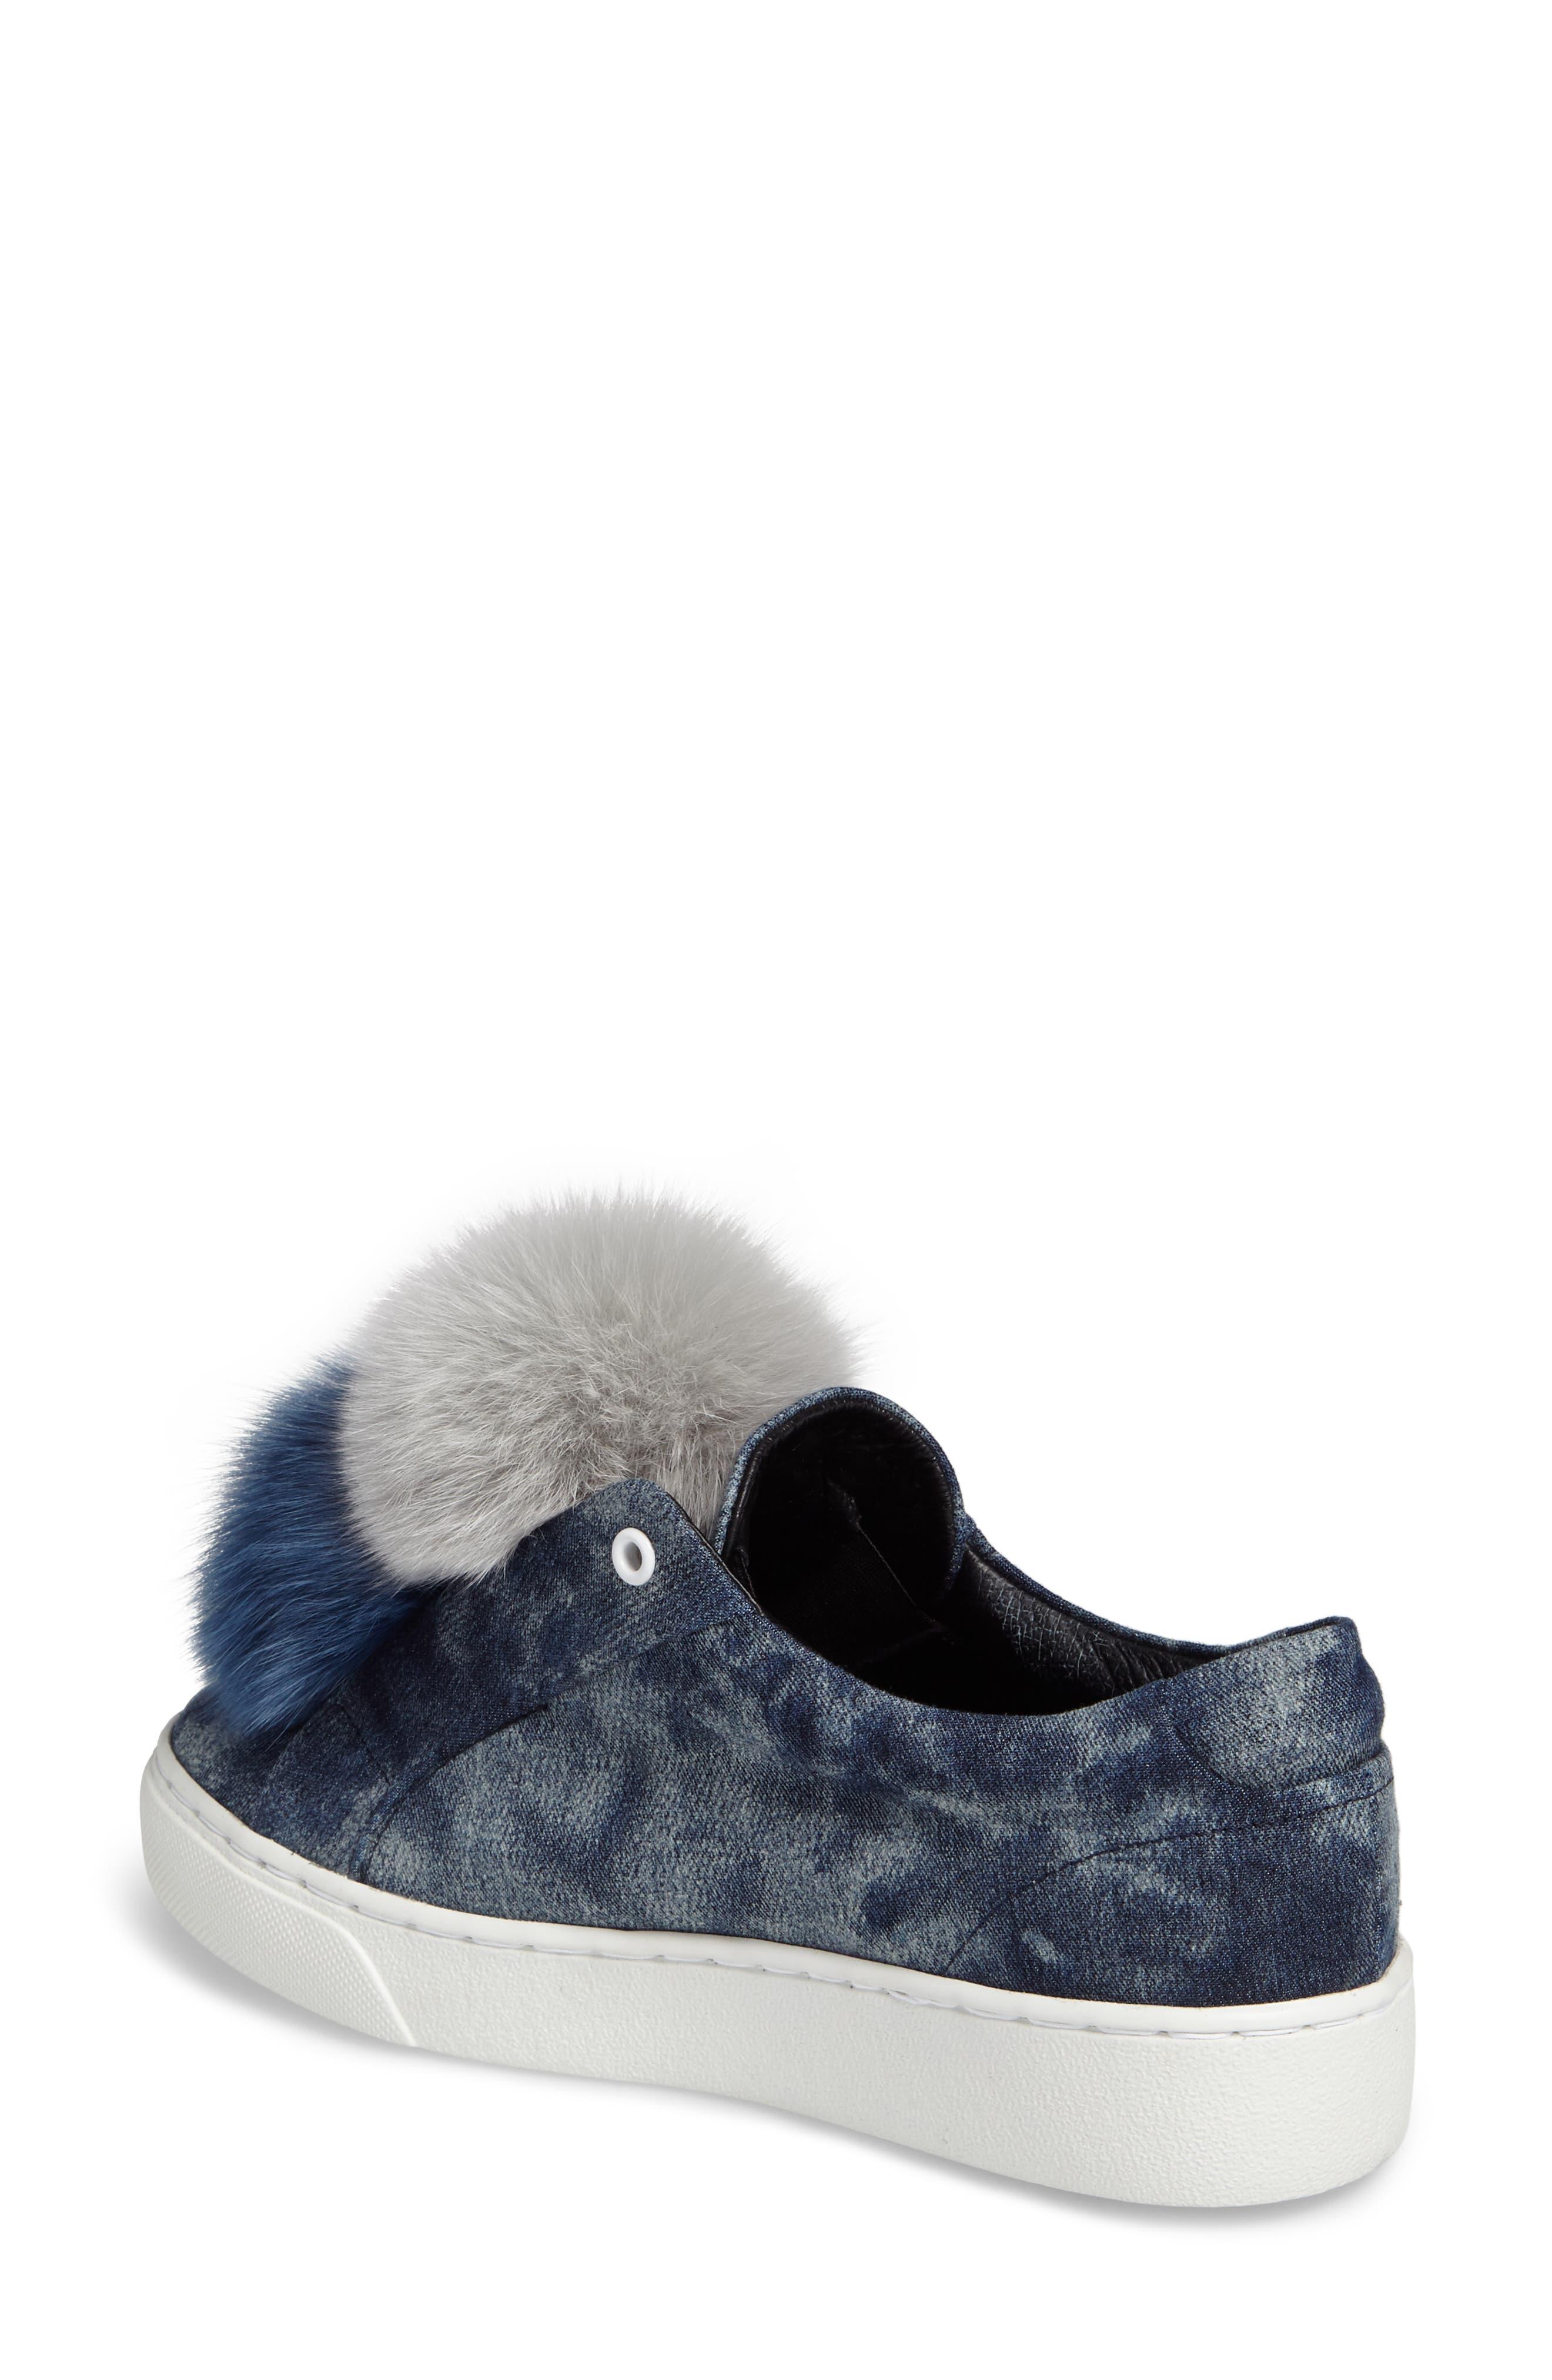 Joey Genuine Fox Fur Trim Sneaker,                             Alternate thumbnail 2, color,                             460